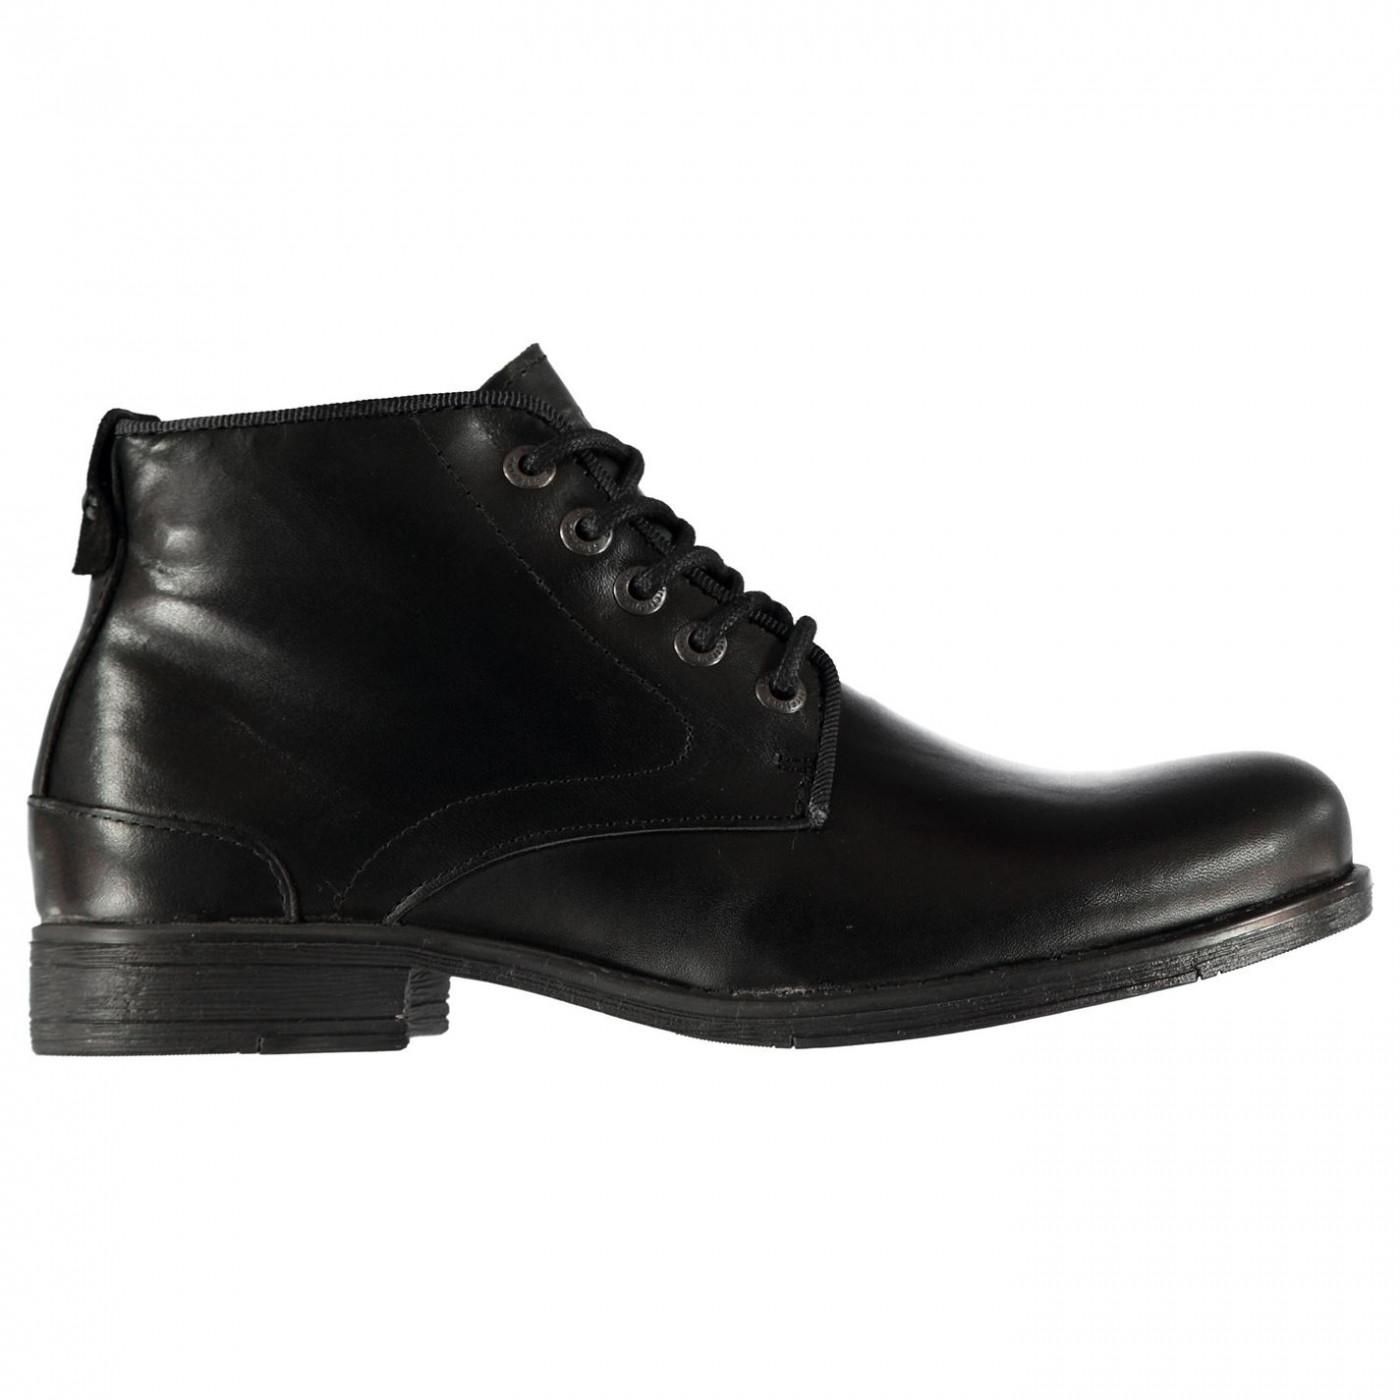 Firetrap Casca Junior Boys Boots